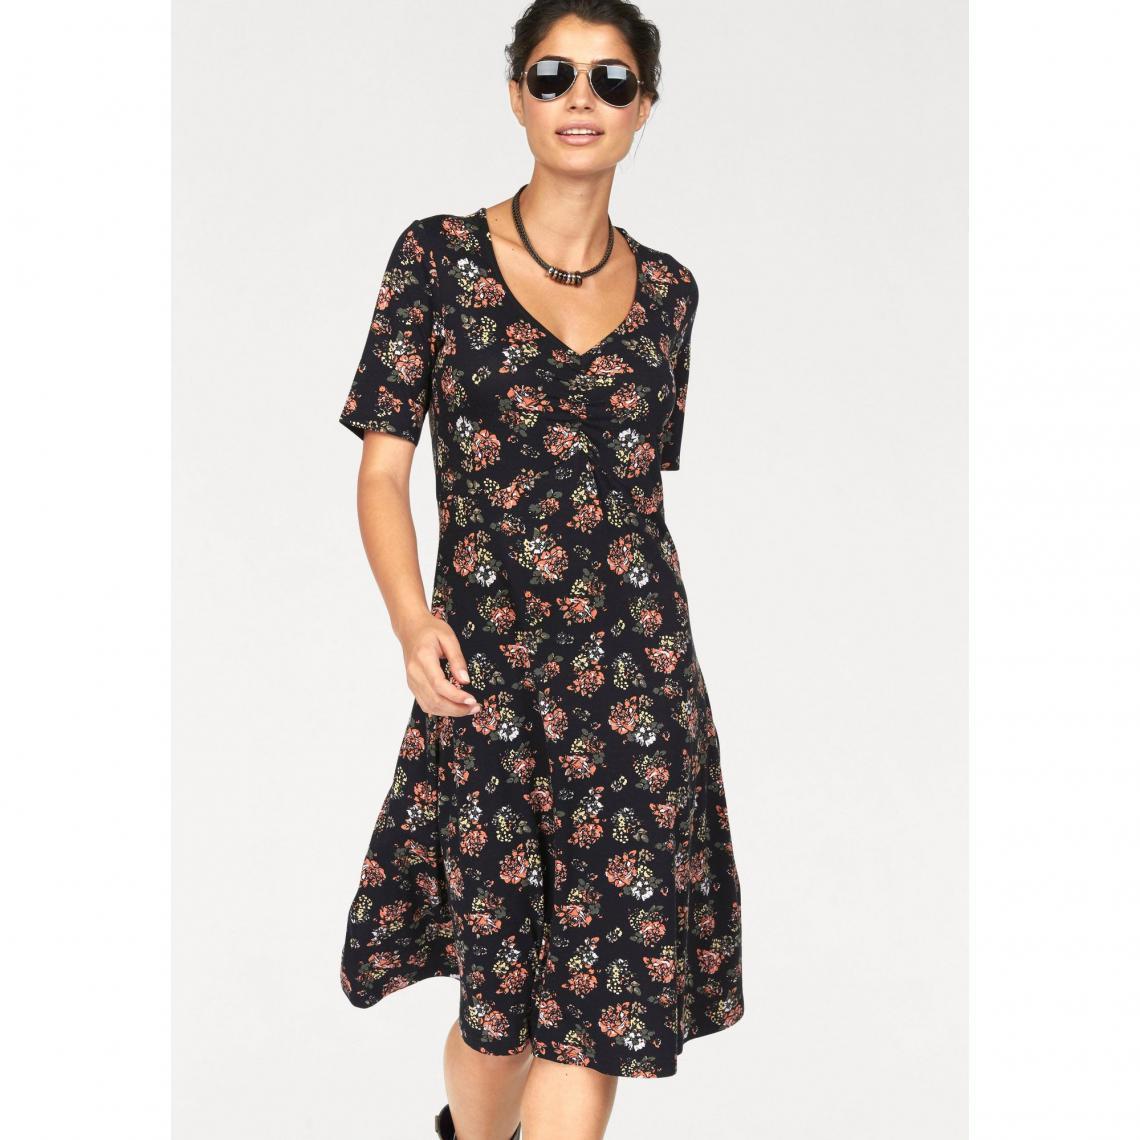 c042b5c79c5 Robe imprimé fleuri col V manches courtes stretch femme BoyseN s -  Multicolore Boysen s Femme